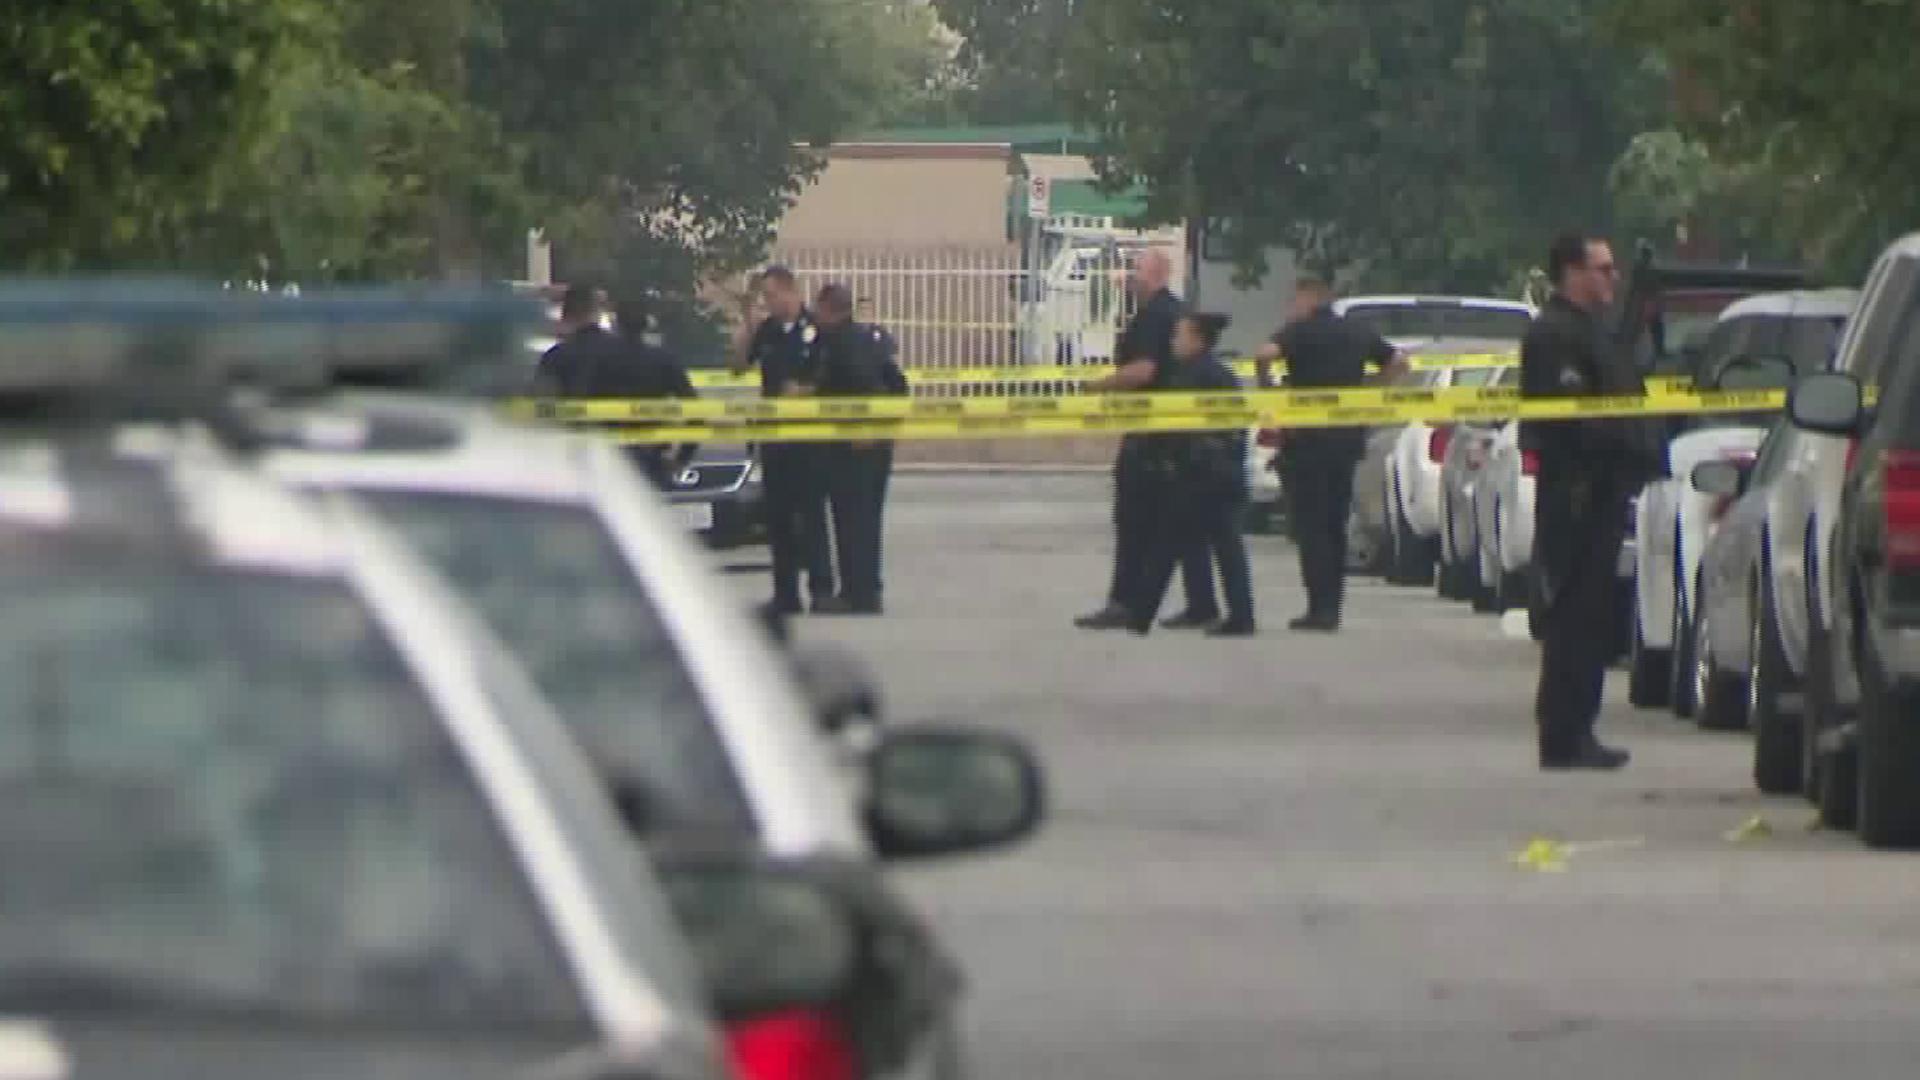 Police investigate the scene of a deadly shooting in Watts on Nov. 18, 2018. (Credit: KTLA)